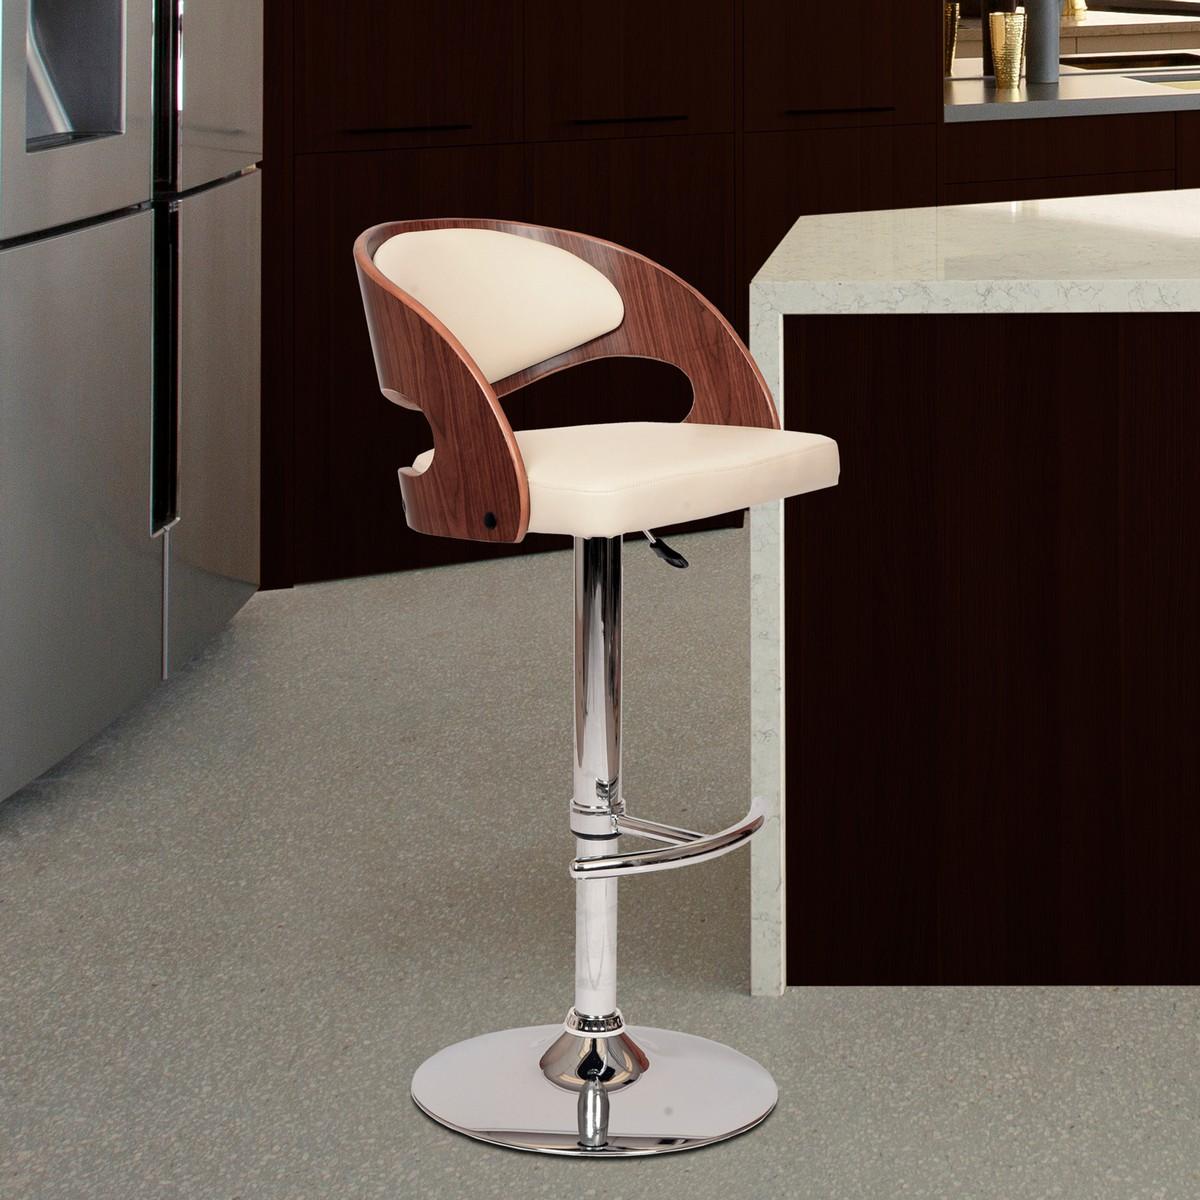 Armen Living Malibu Swivel Barstool In Cream Leatherette/ Walnut Veneer and Chrome Base